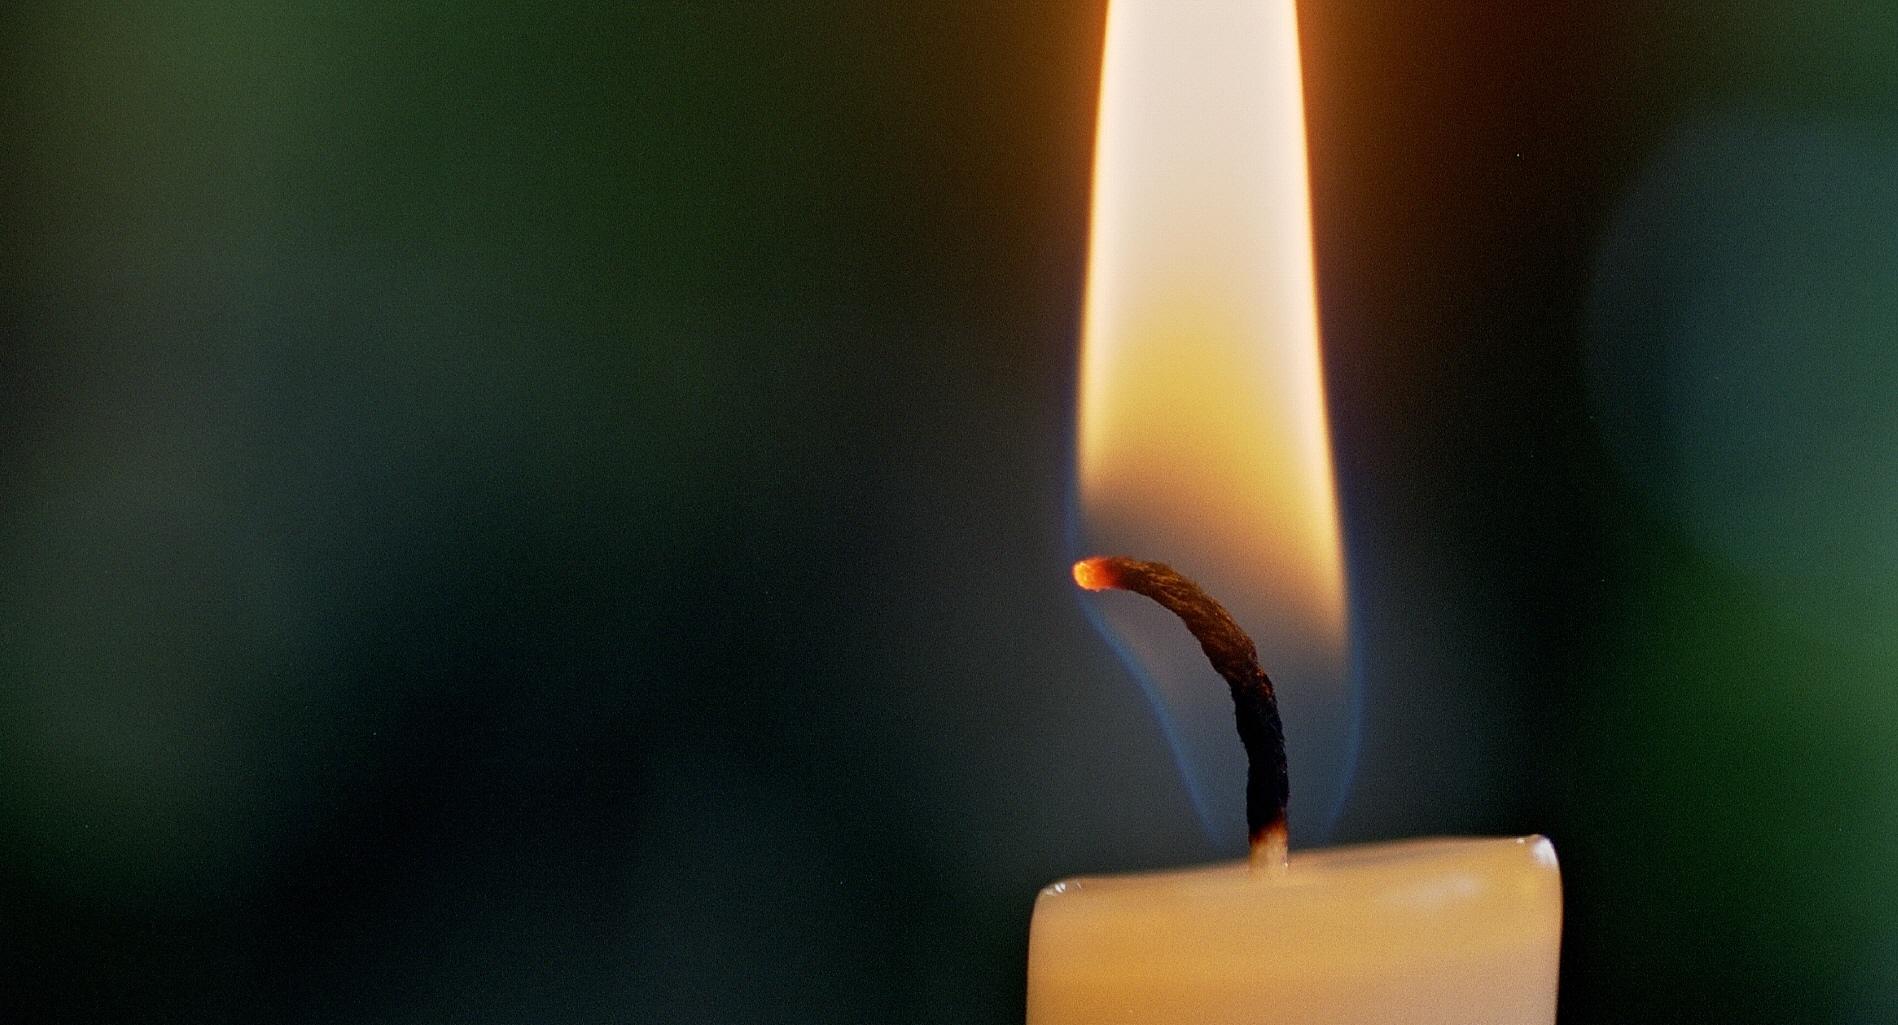 Brennende Kerze Bilder